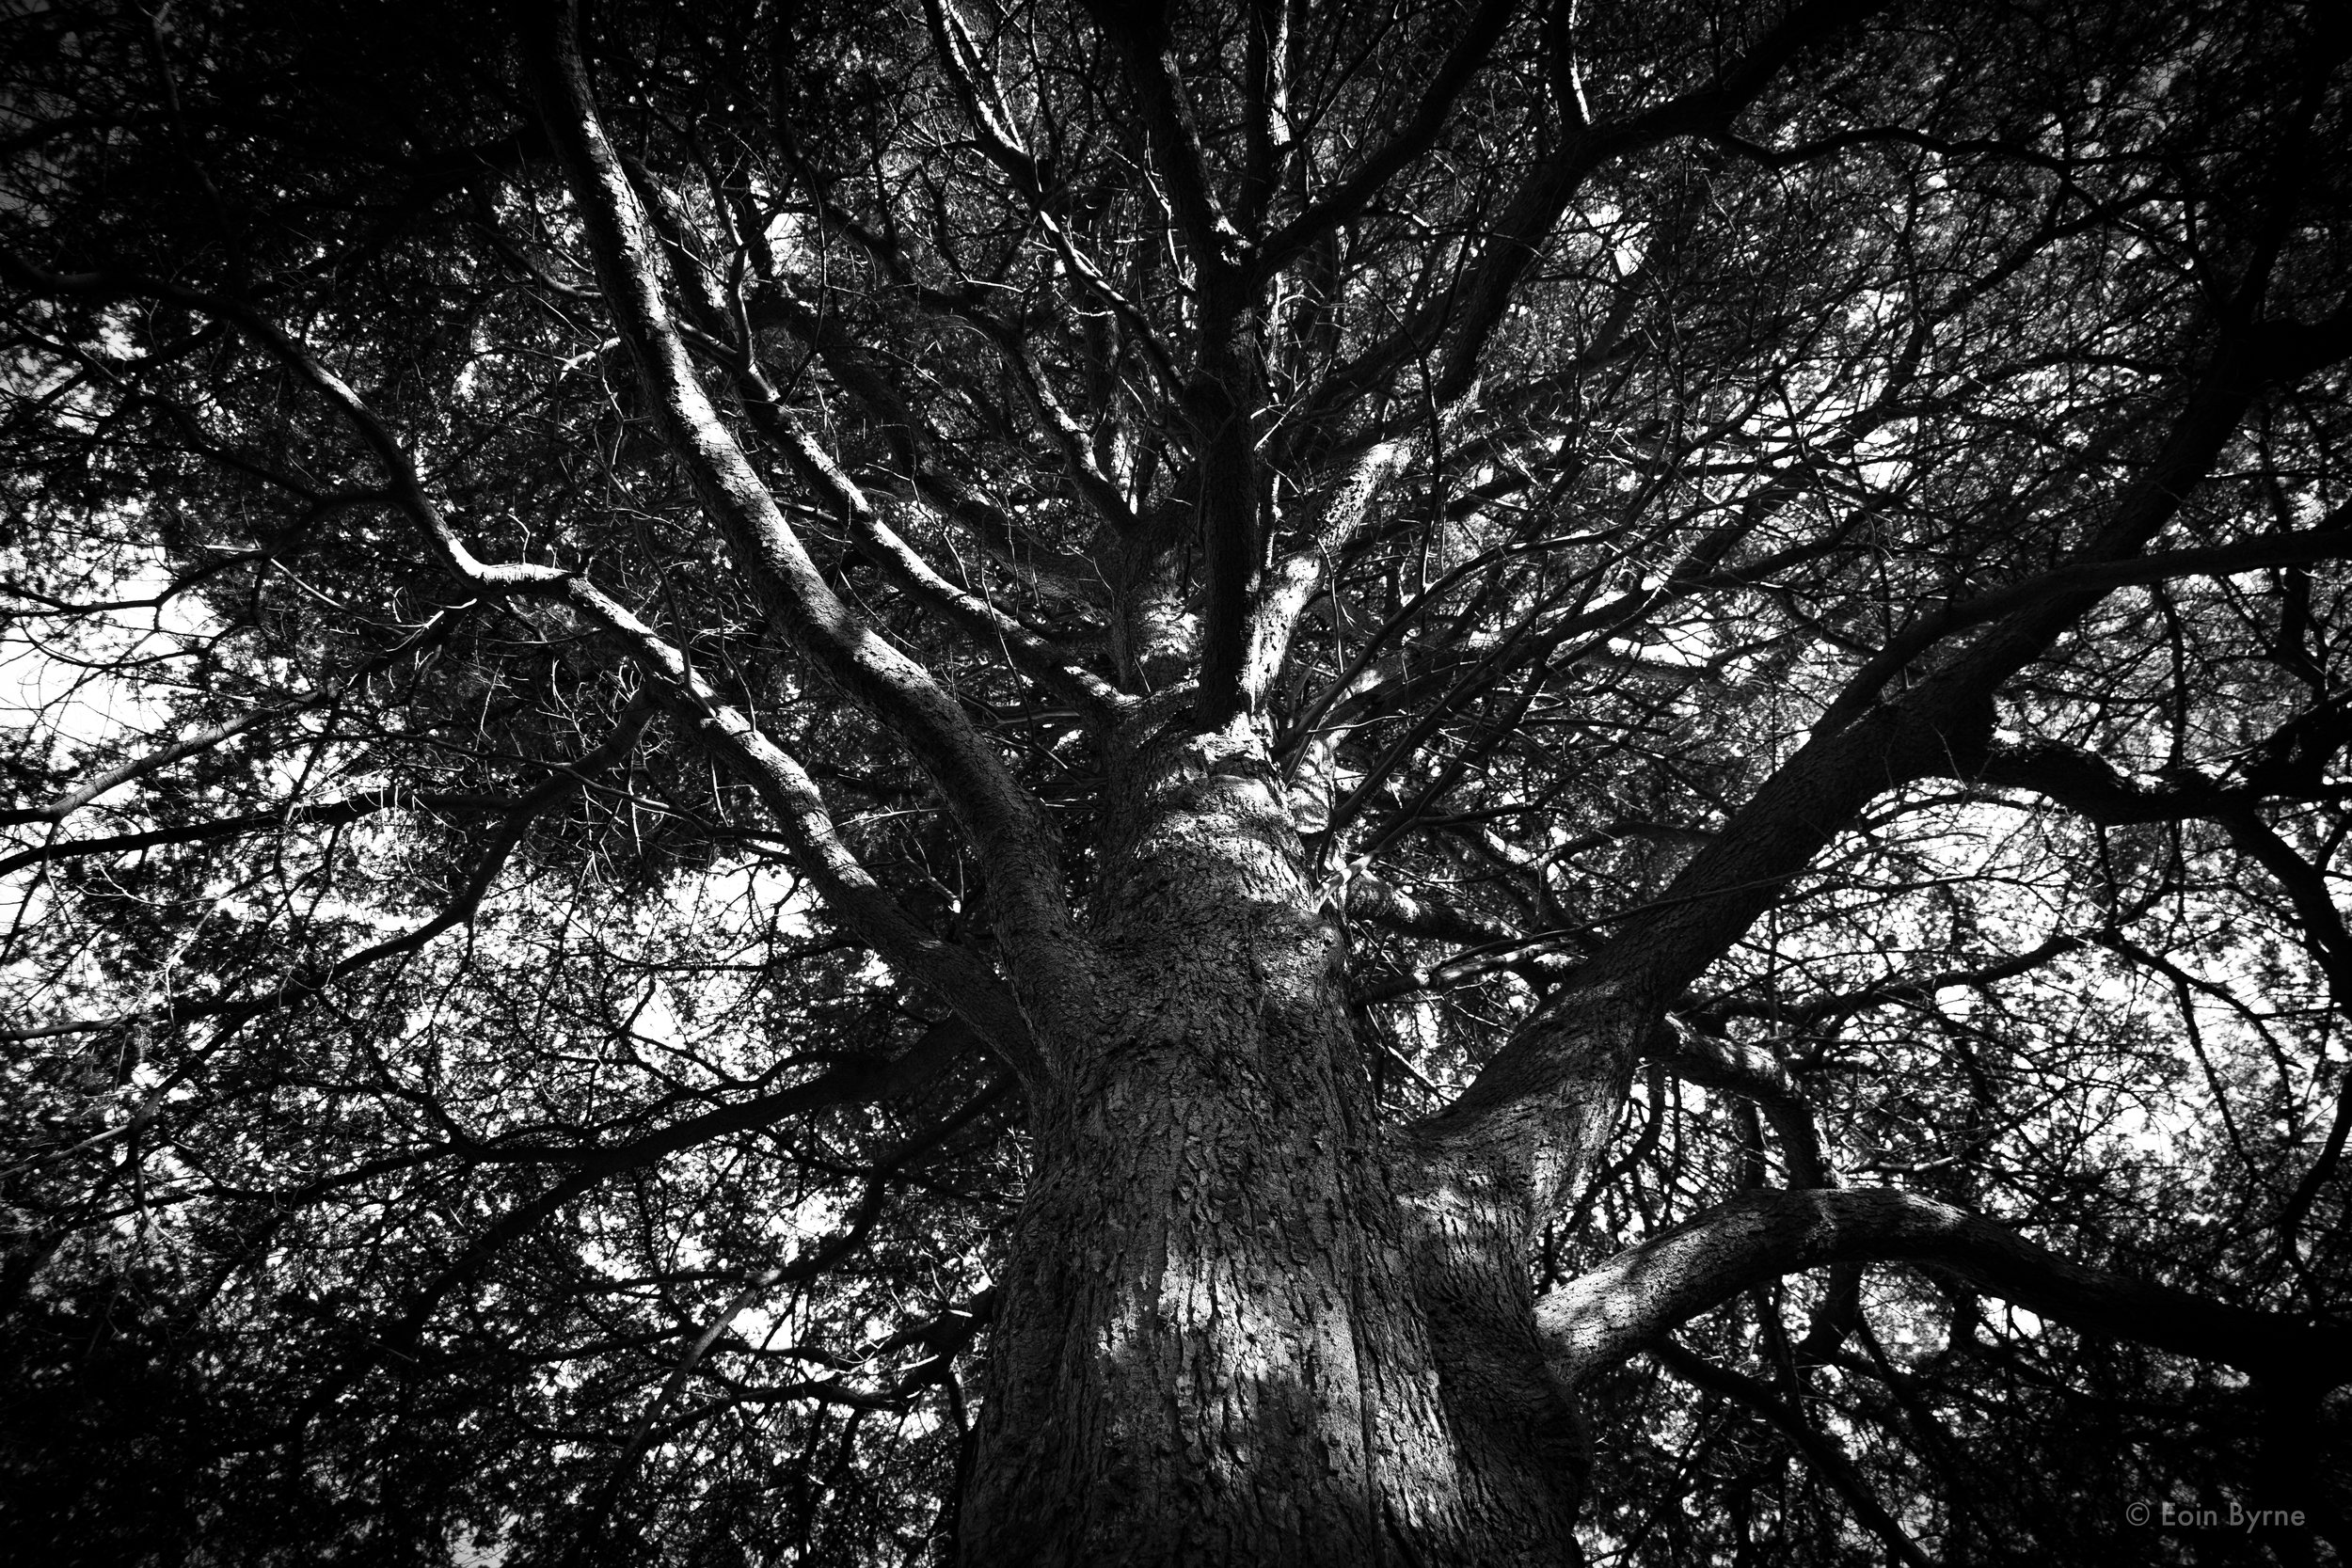 Tree in Palmerston park 2.jpg